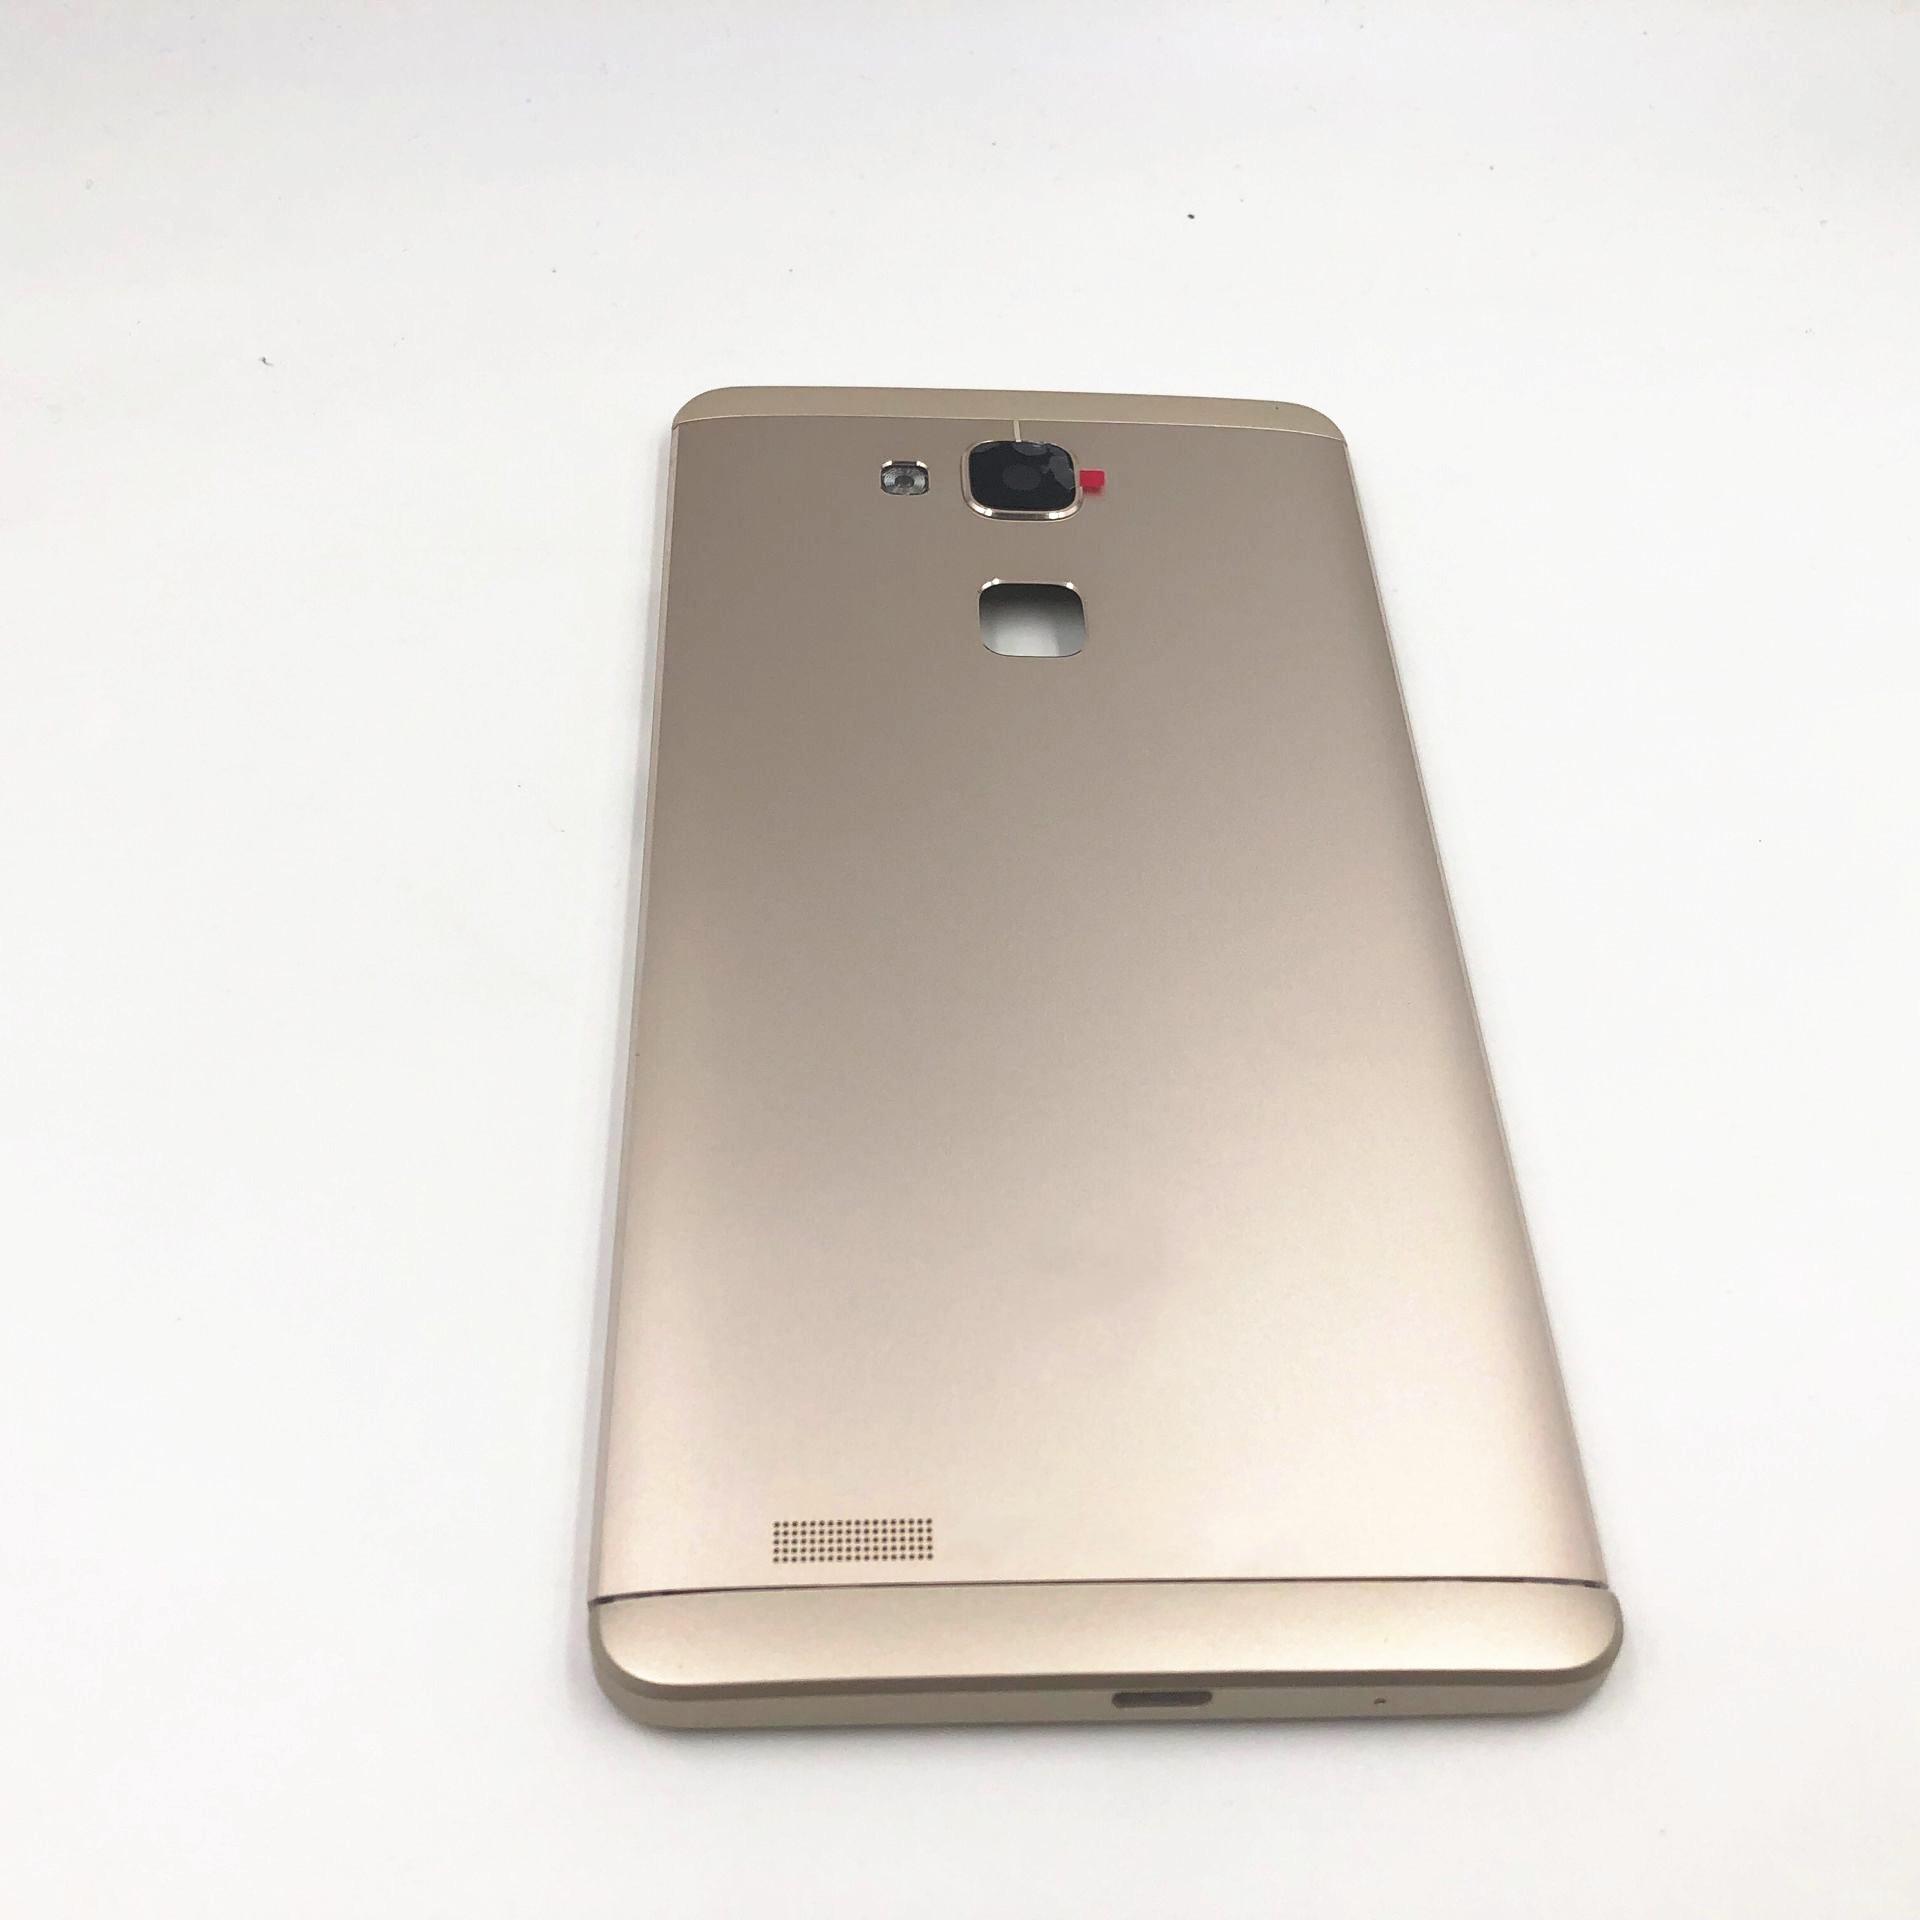 RTBESTOYZ 新バッテリードア裏表紙ハウジングケース Huawei 社メイト 7 Mate7 とカメラレンズ + 電源ボリュームボタン